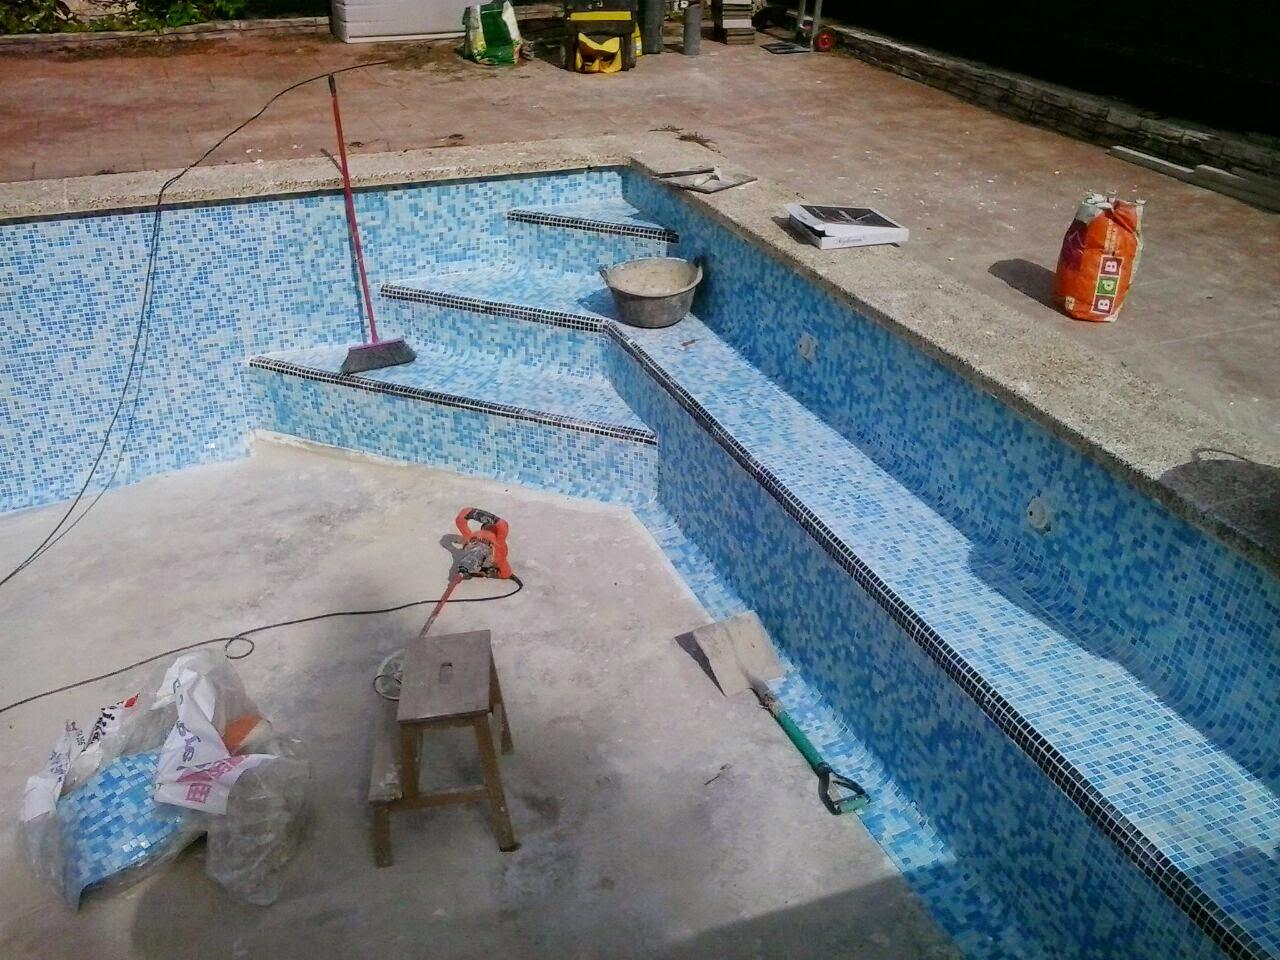 Reforma barata escaleras obra en piscinas for Escaleras para piscinas de obra